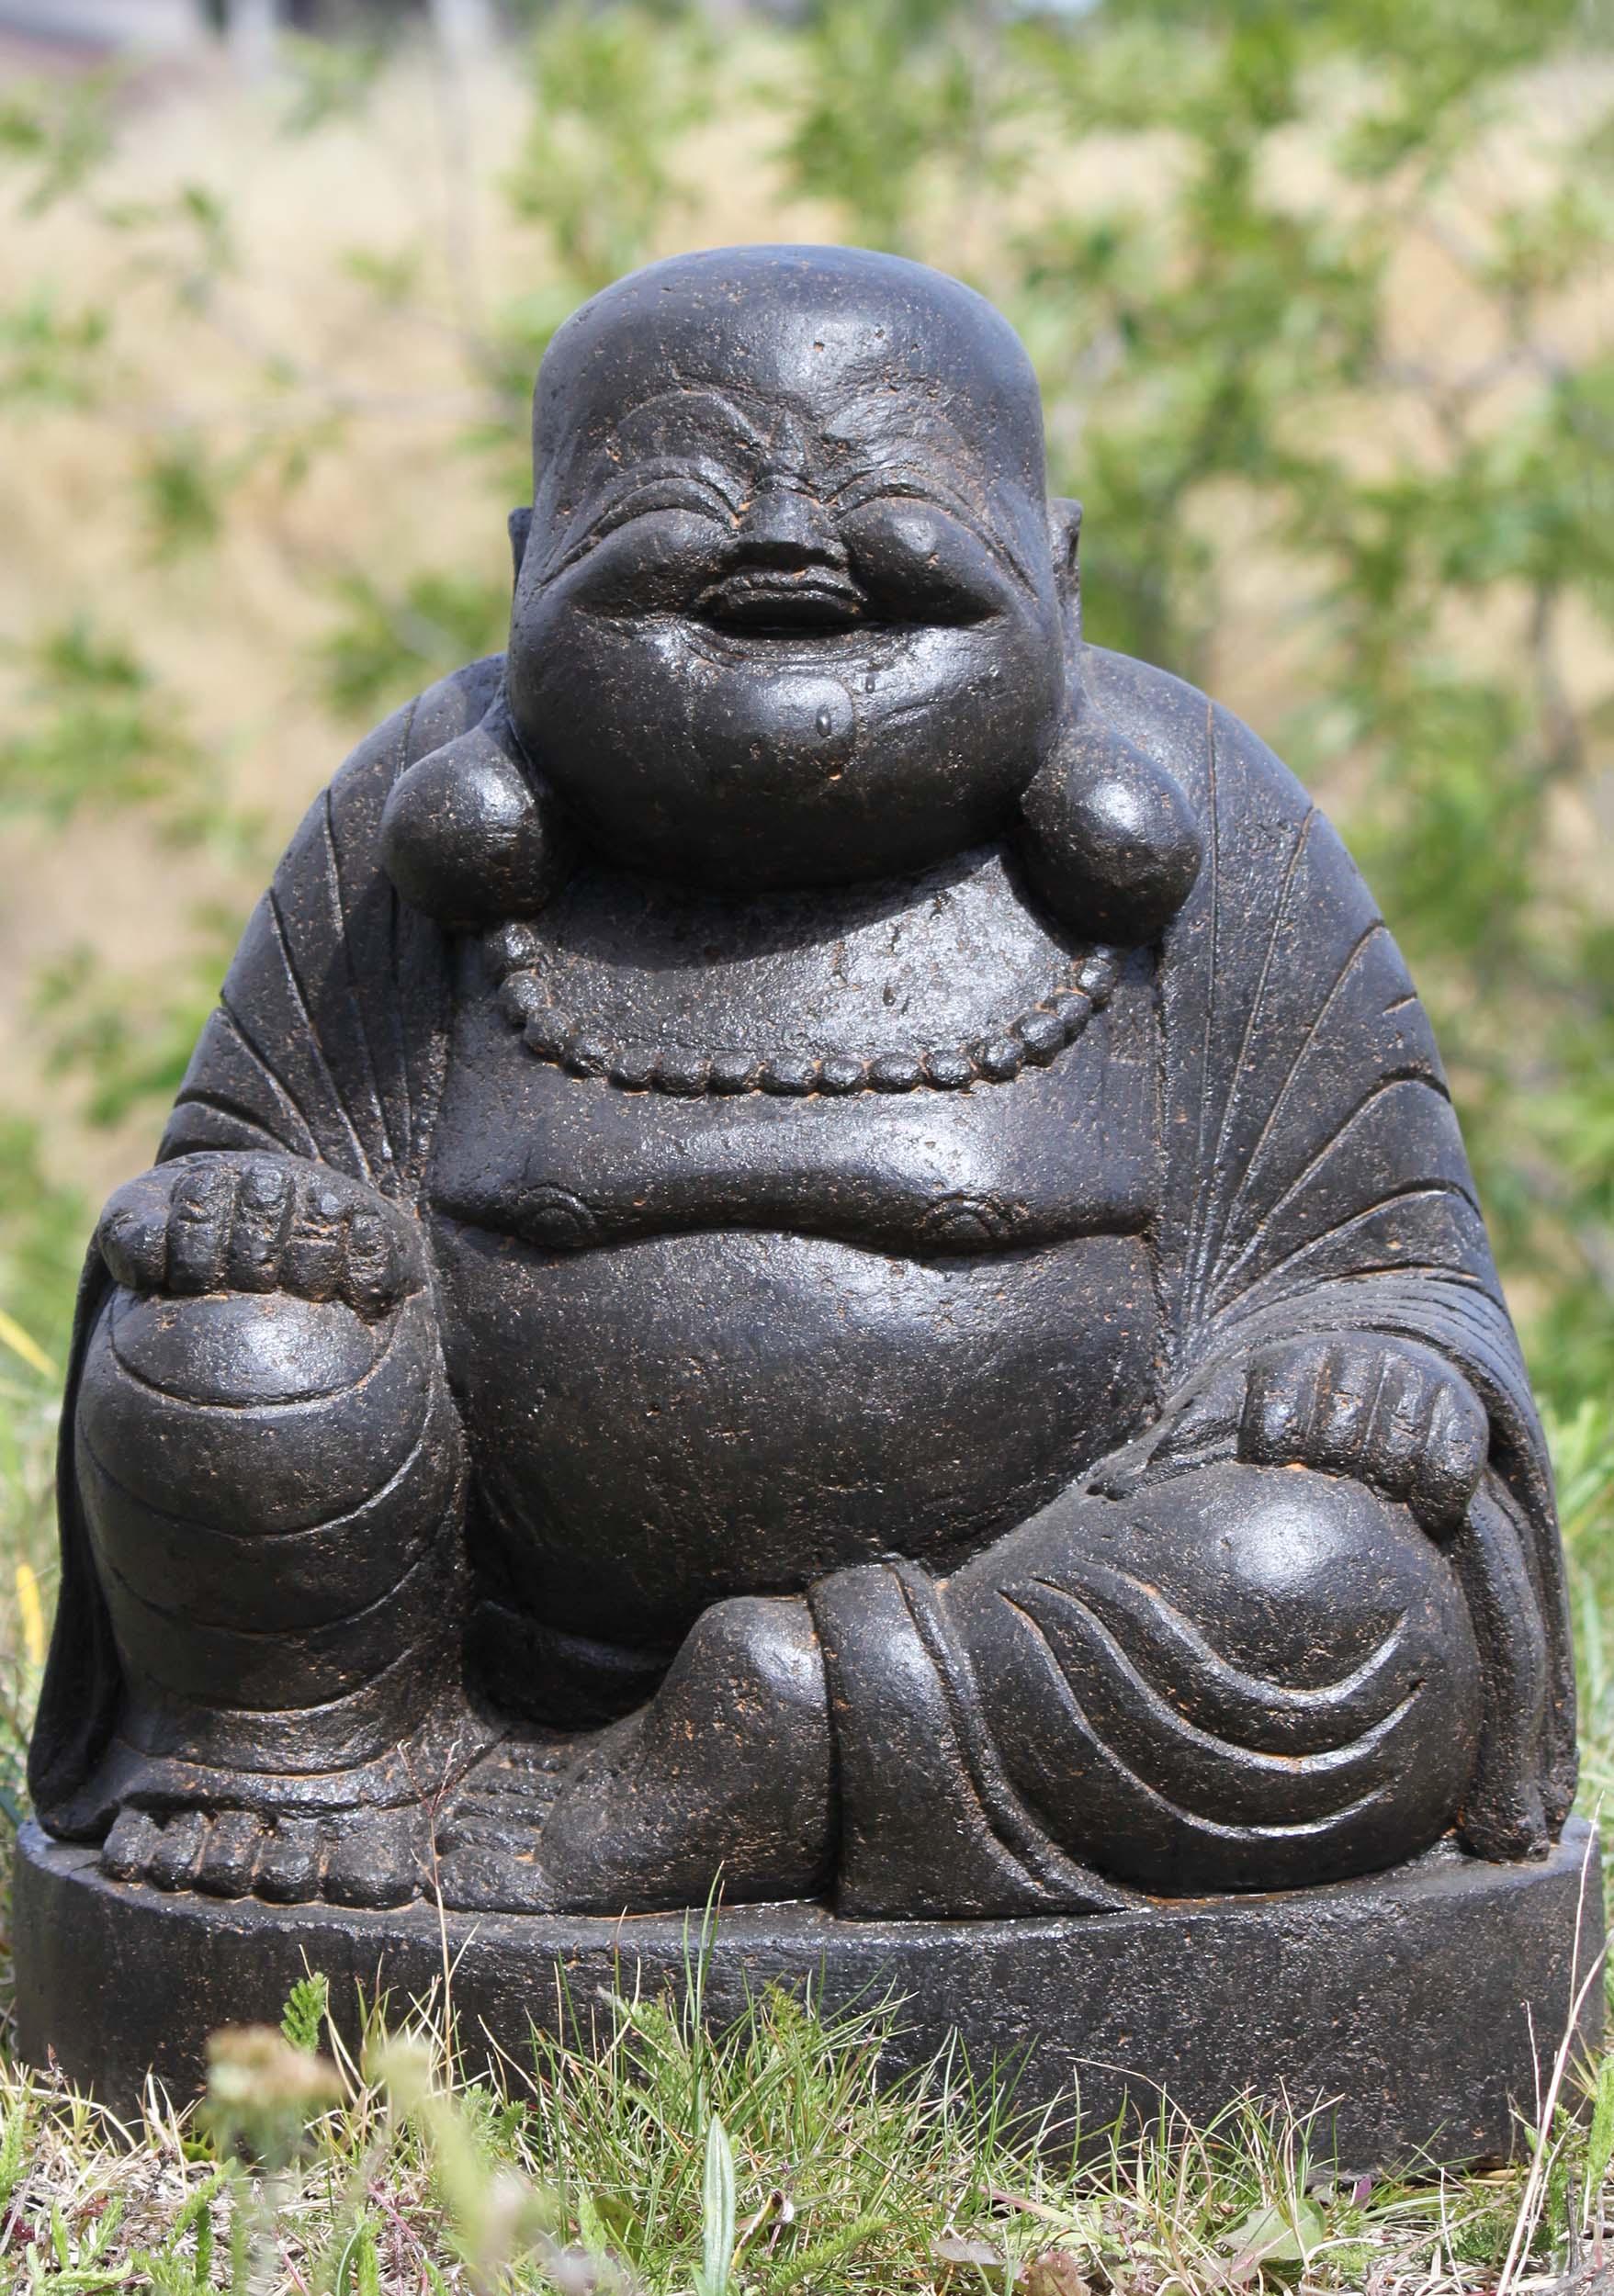 Sold Stone Fat And Happy Garden Buddha Statue 19 100ls348 Hindu Gods Buddha Statues